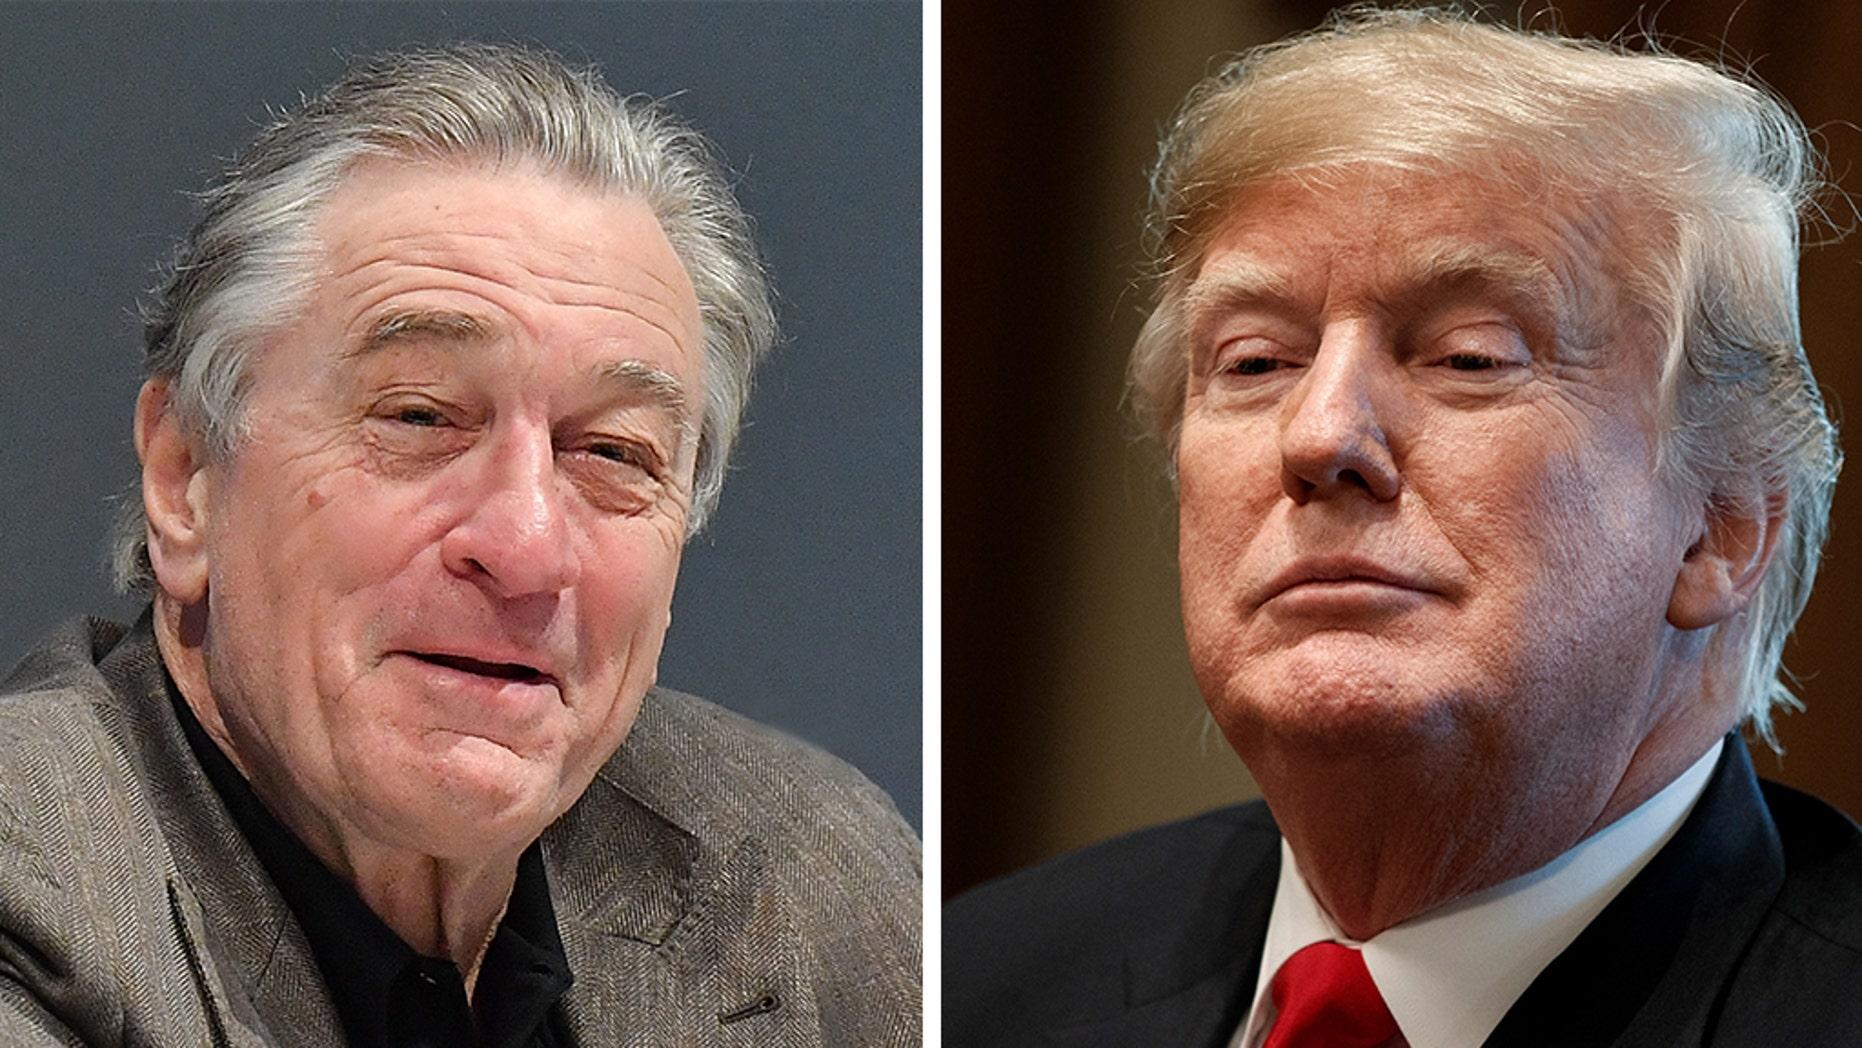 Top: Robert De Niro slams Trump White House: 'Like a ...